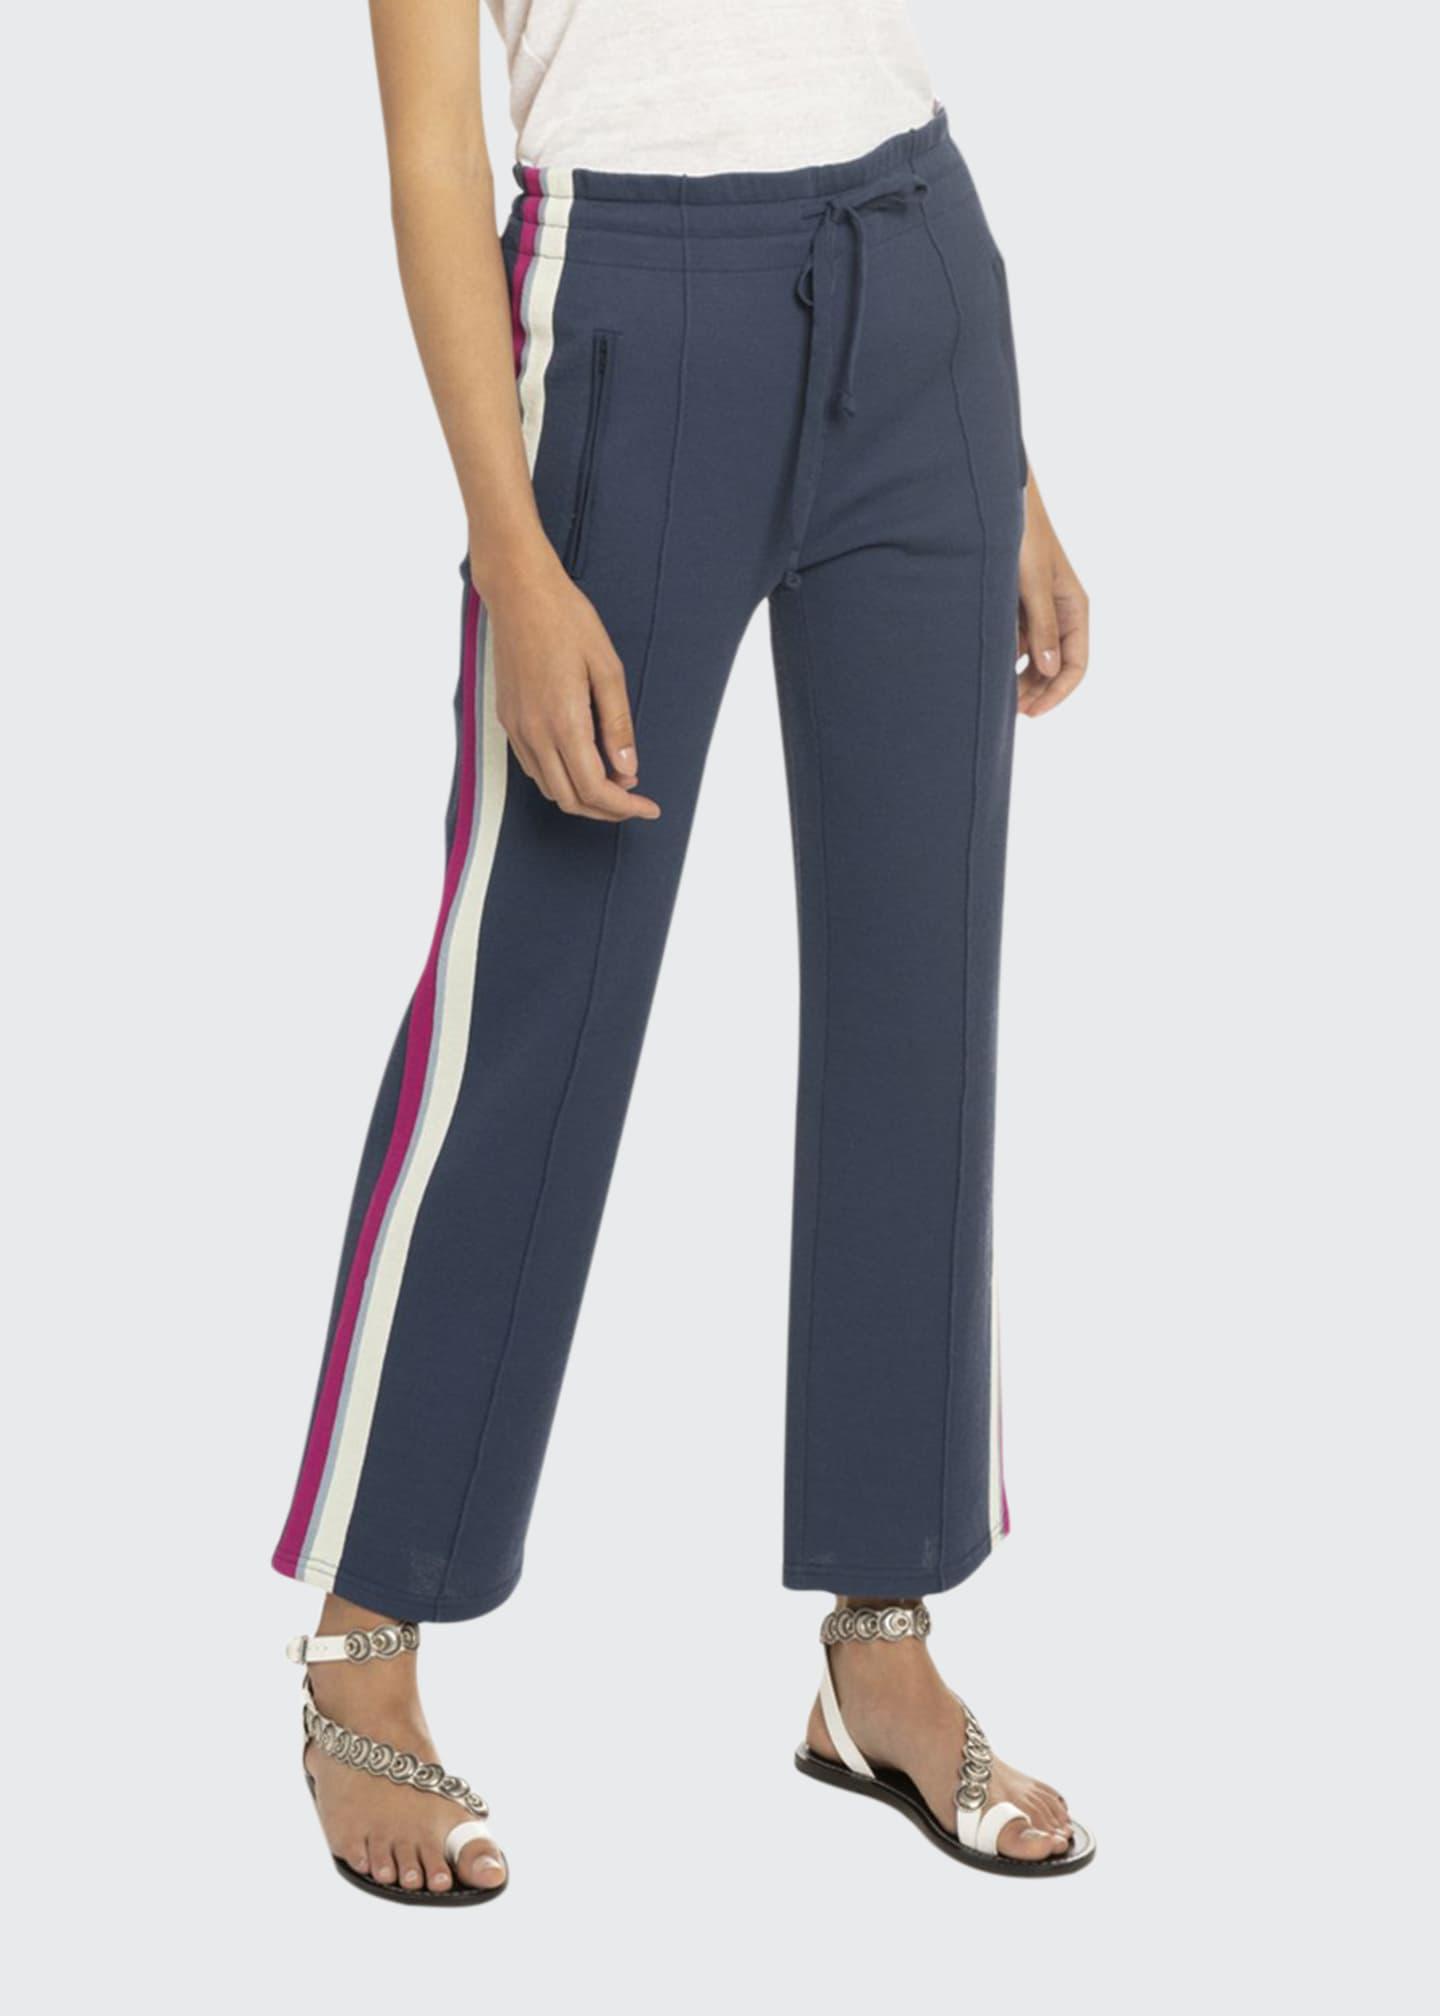 Etoile Isabel Marant Dobbs Sporty-Knit Drawstring Jogger Pants